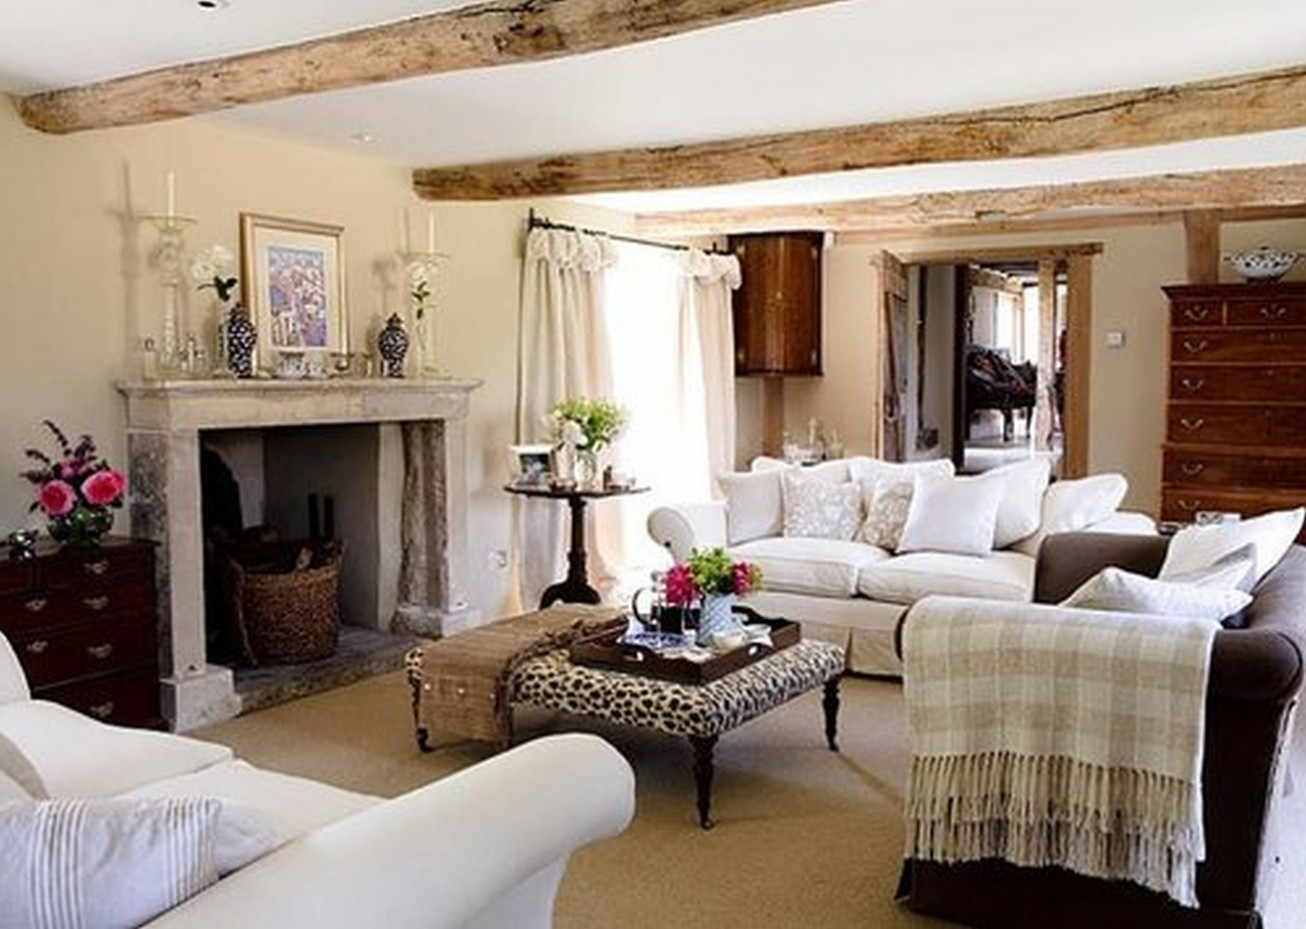 farmhouse-living-room-decor-background-hd-wallpaper-with-diy-farmhouse-decor-ideas-farmhouse-decor-catalog-farmhouse-decor-on-living-room